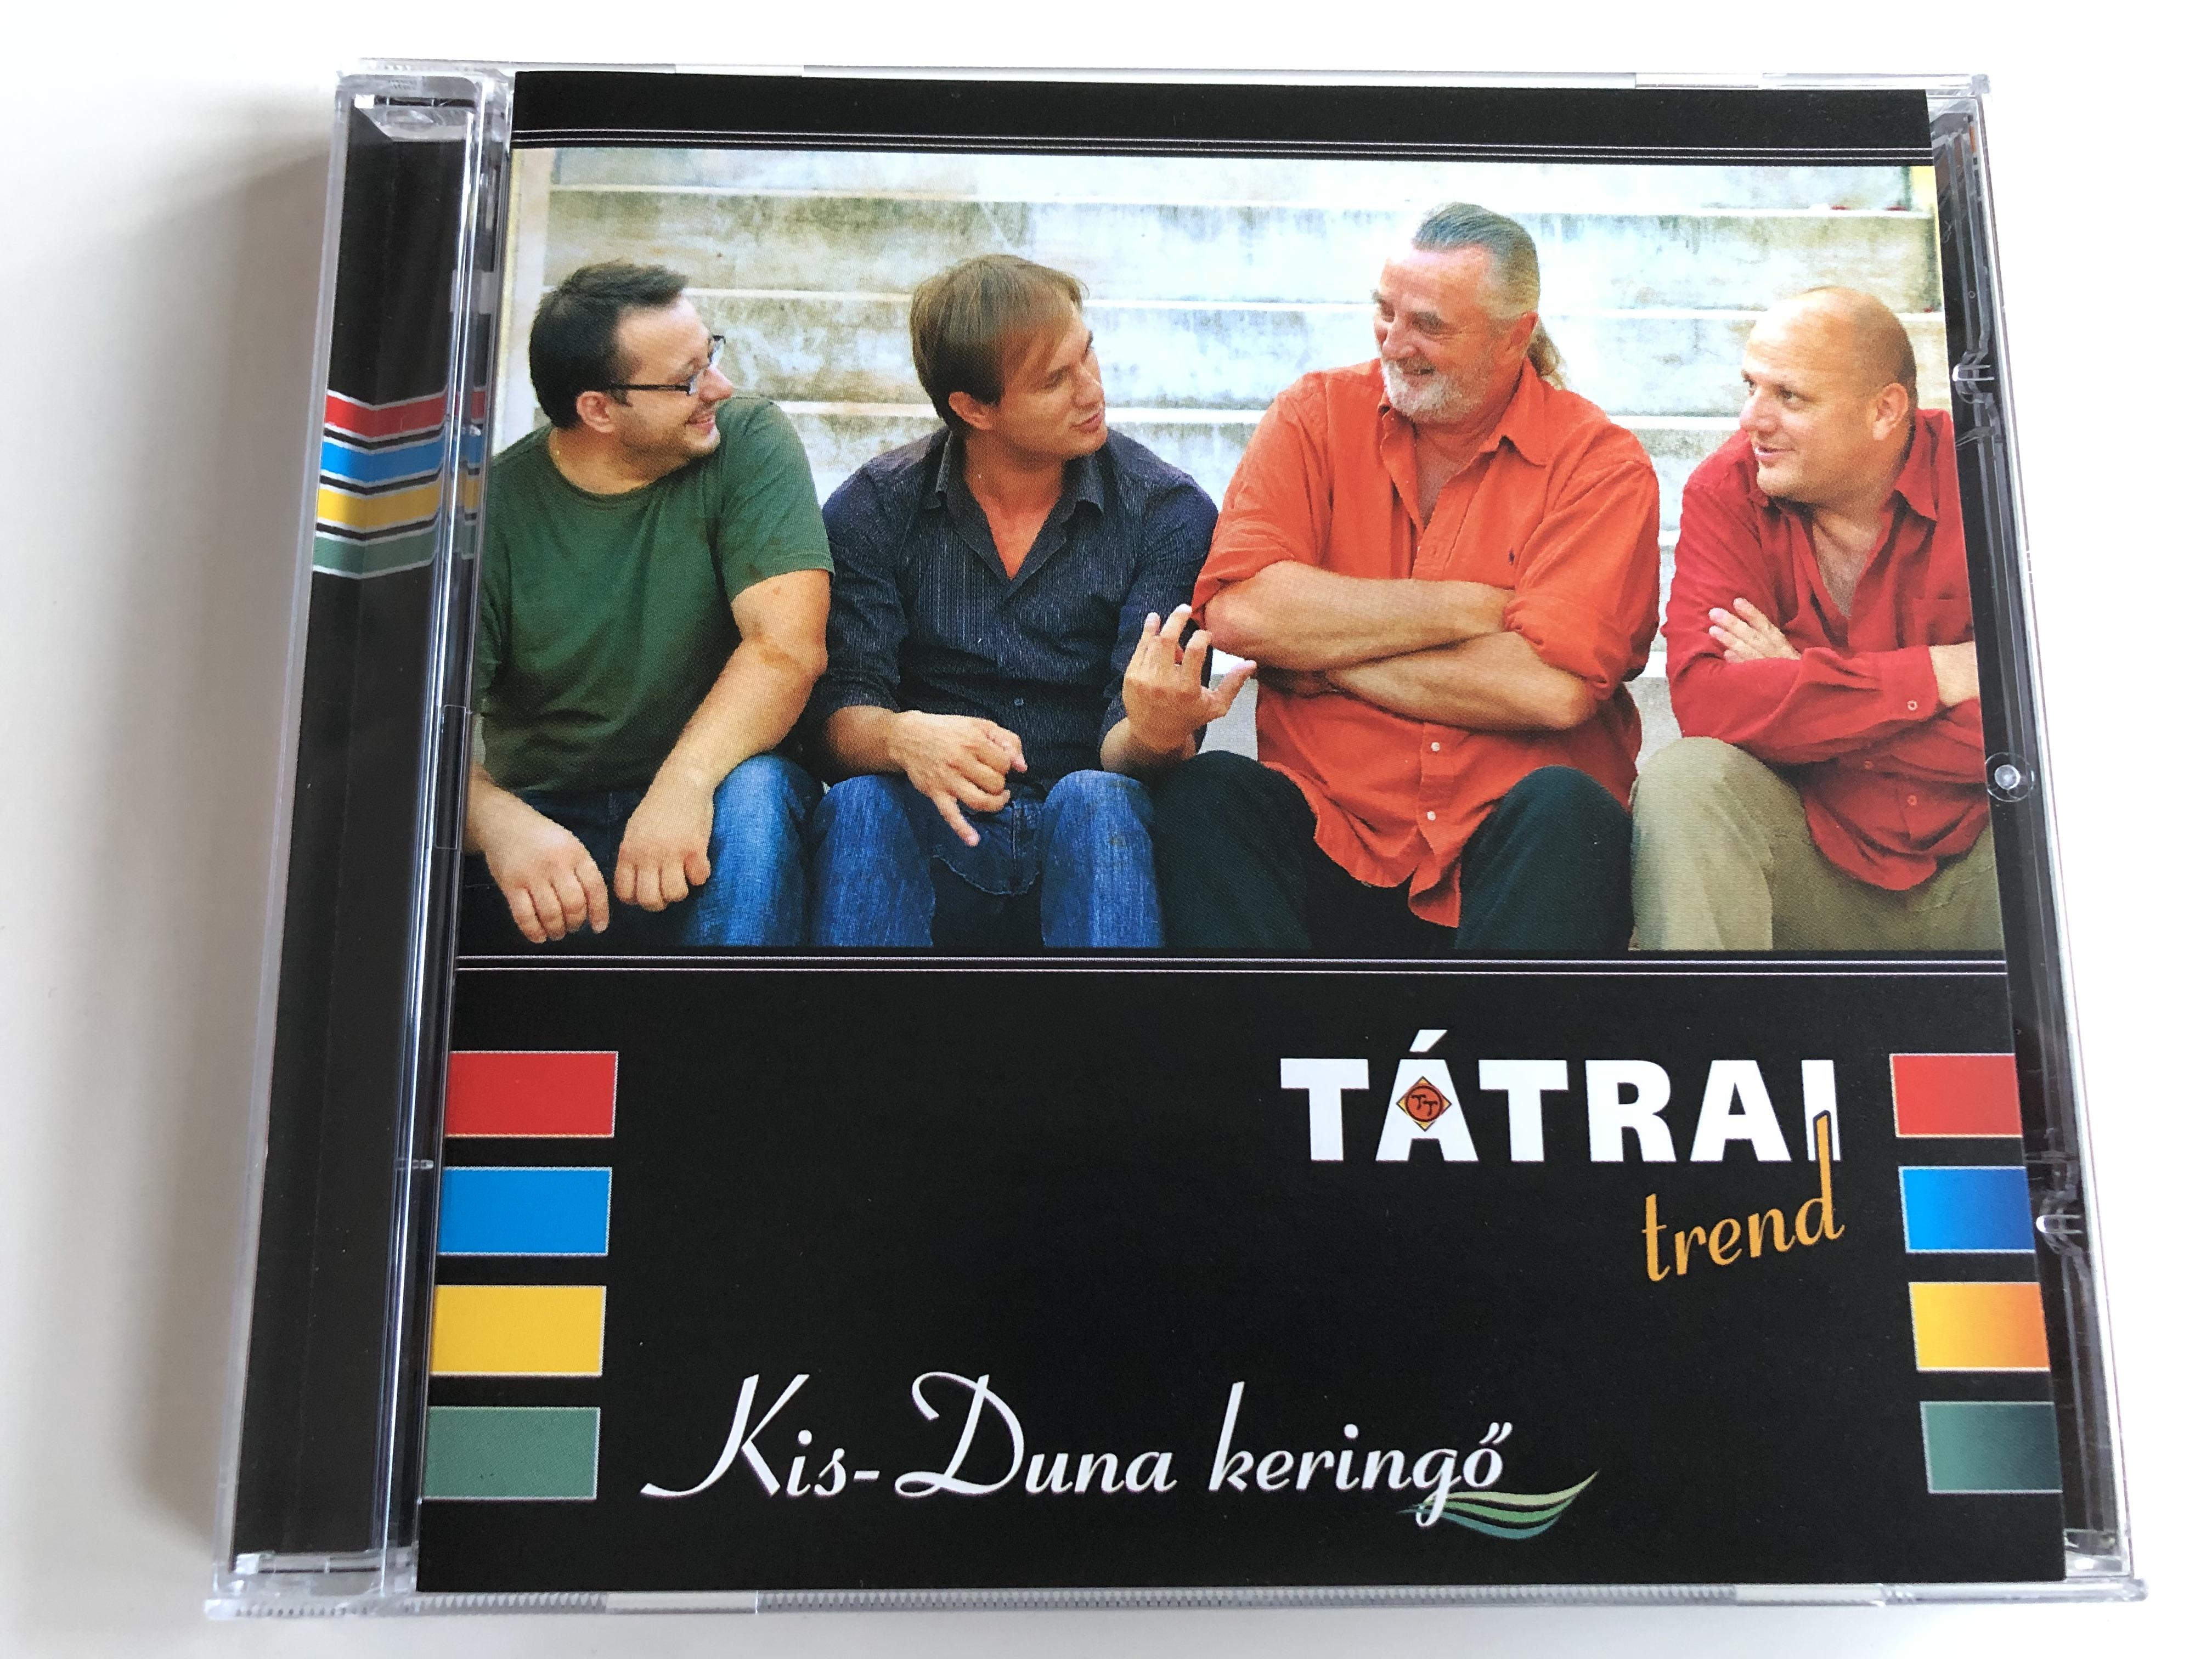 ta-tra-trendimg-2061.jpg